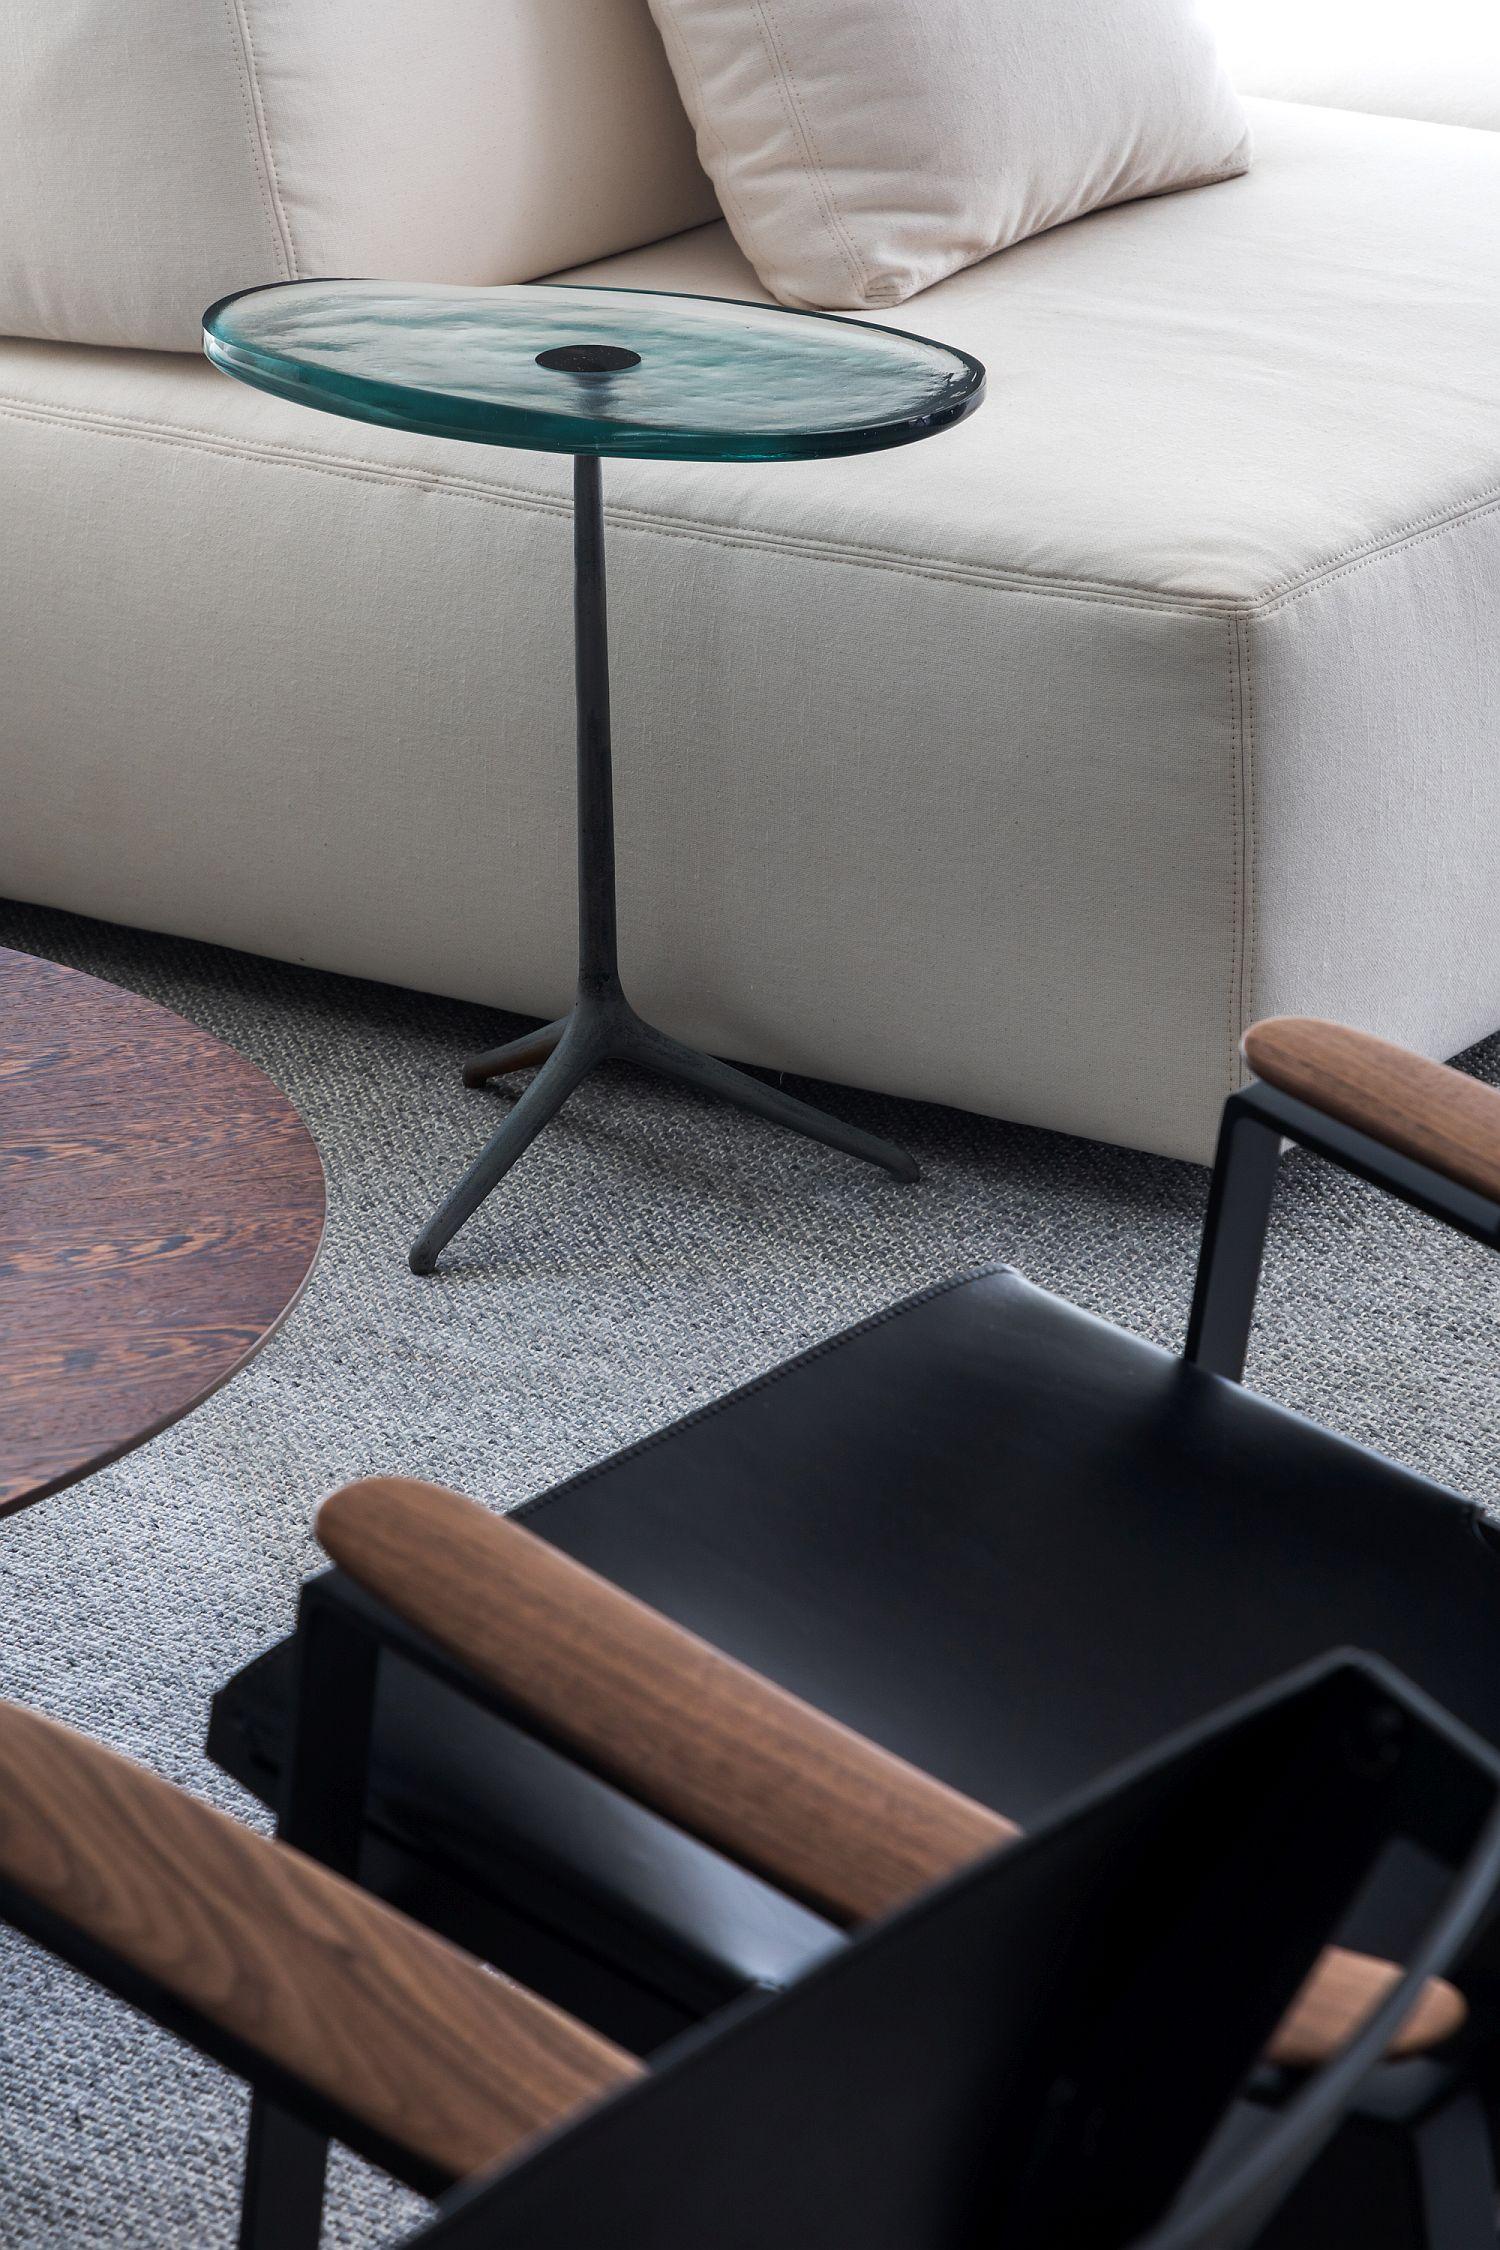 Decor designed by Jader Almeida steals the show inside the home